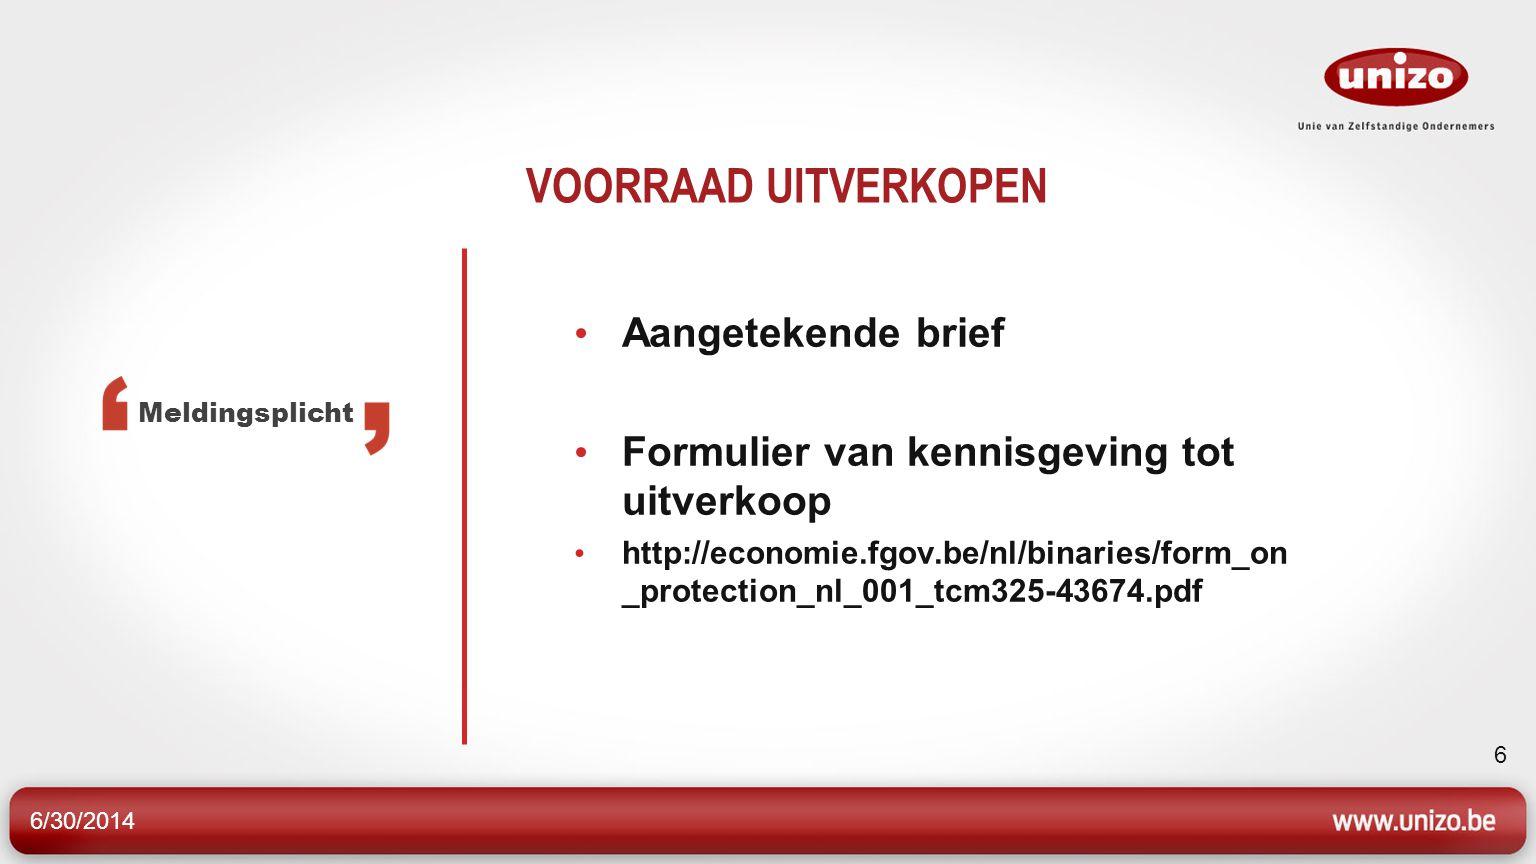 6/30/2014 6 VOORRAAD UITVERKOPEN • Aangetekende brief • Formulier van kennisgeving tot uitverkoop • http://economie.fgov.be/nl/binaries/form_on _protection_nl_001_tcm325-43674.pdf Meldingsplicht